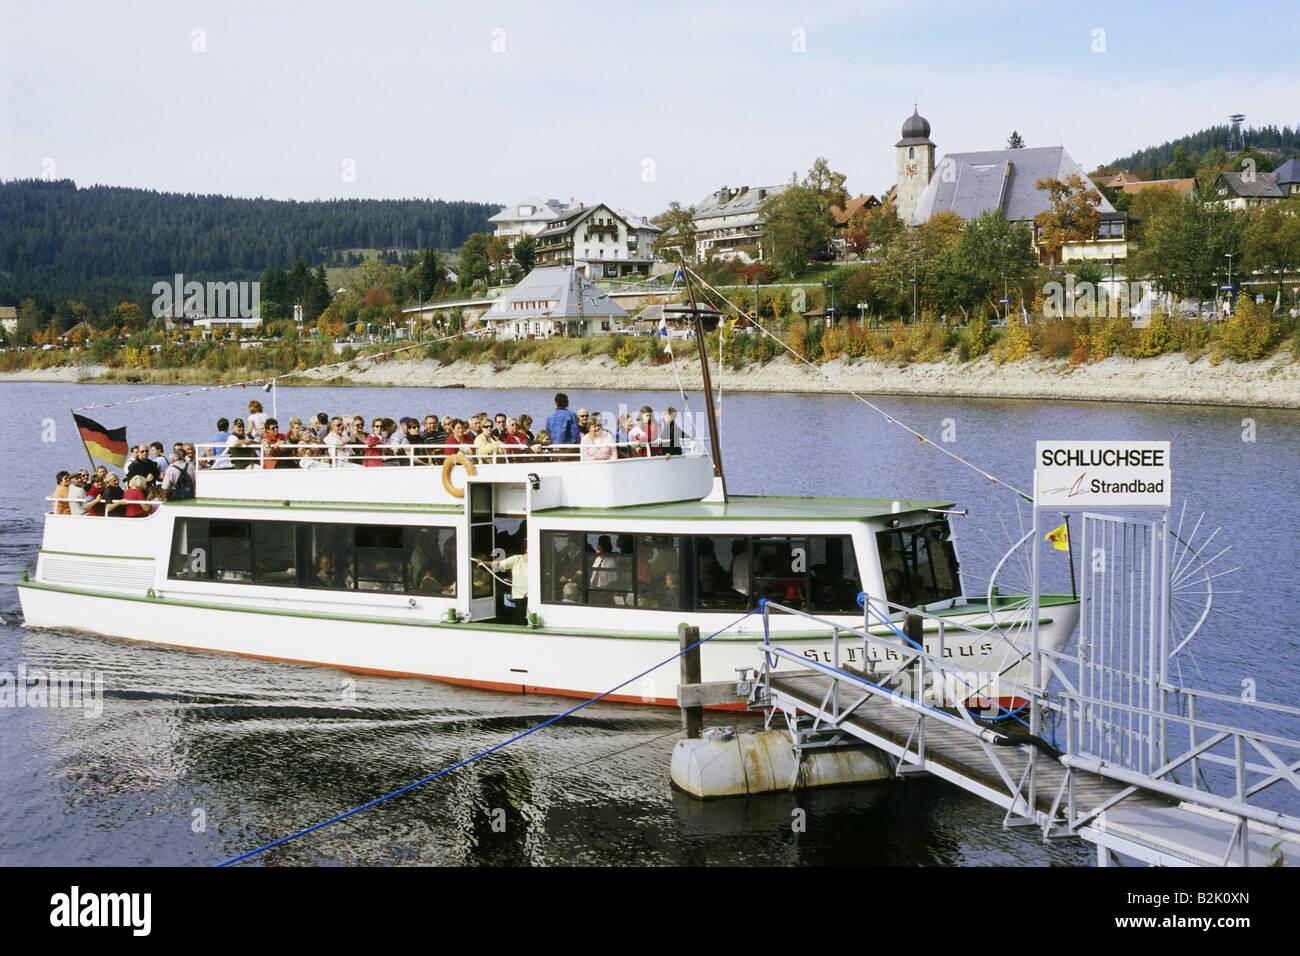 transport / transportation, tourist ship on Schluchsee in Black Forest, Südschwarzwald (South Black Forest), - Stock Image